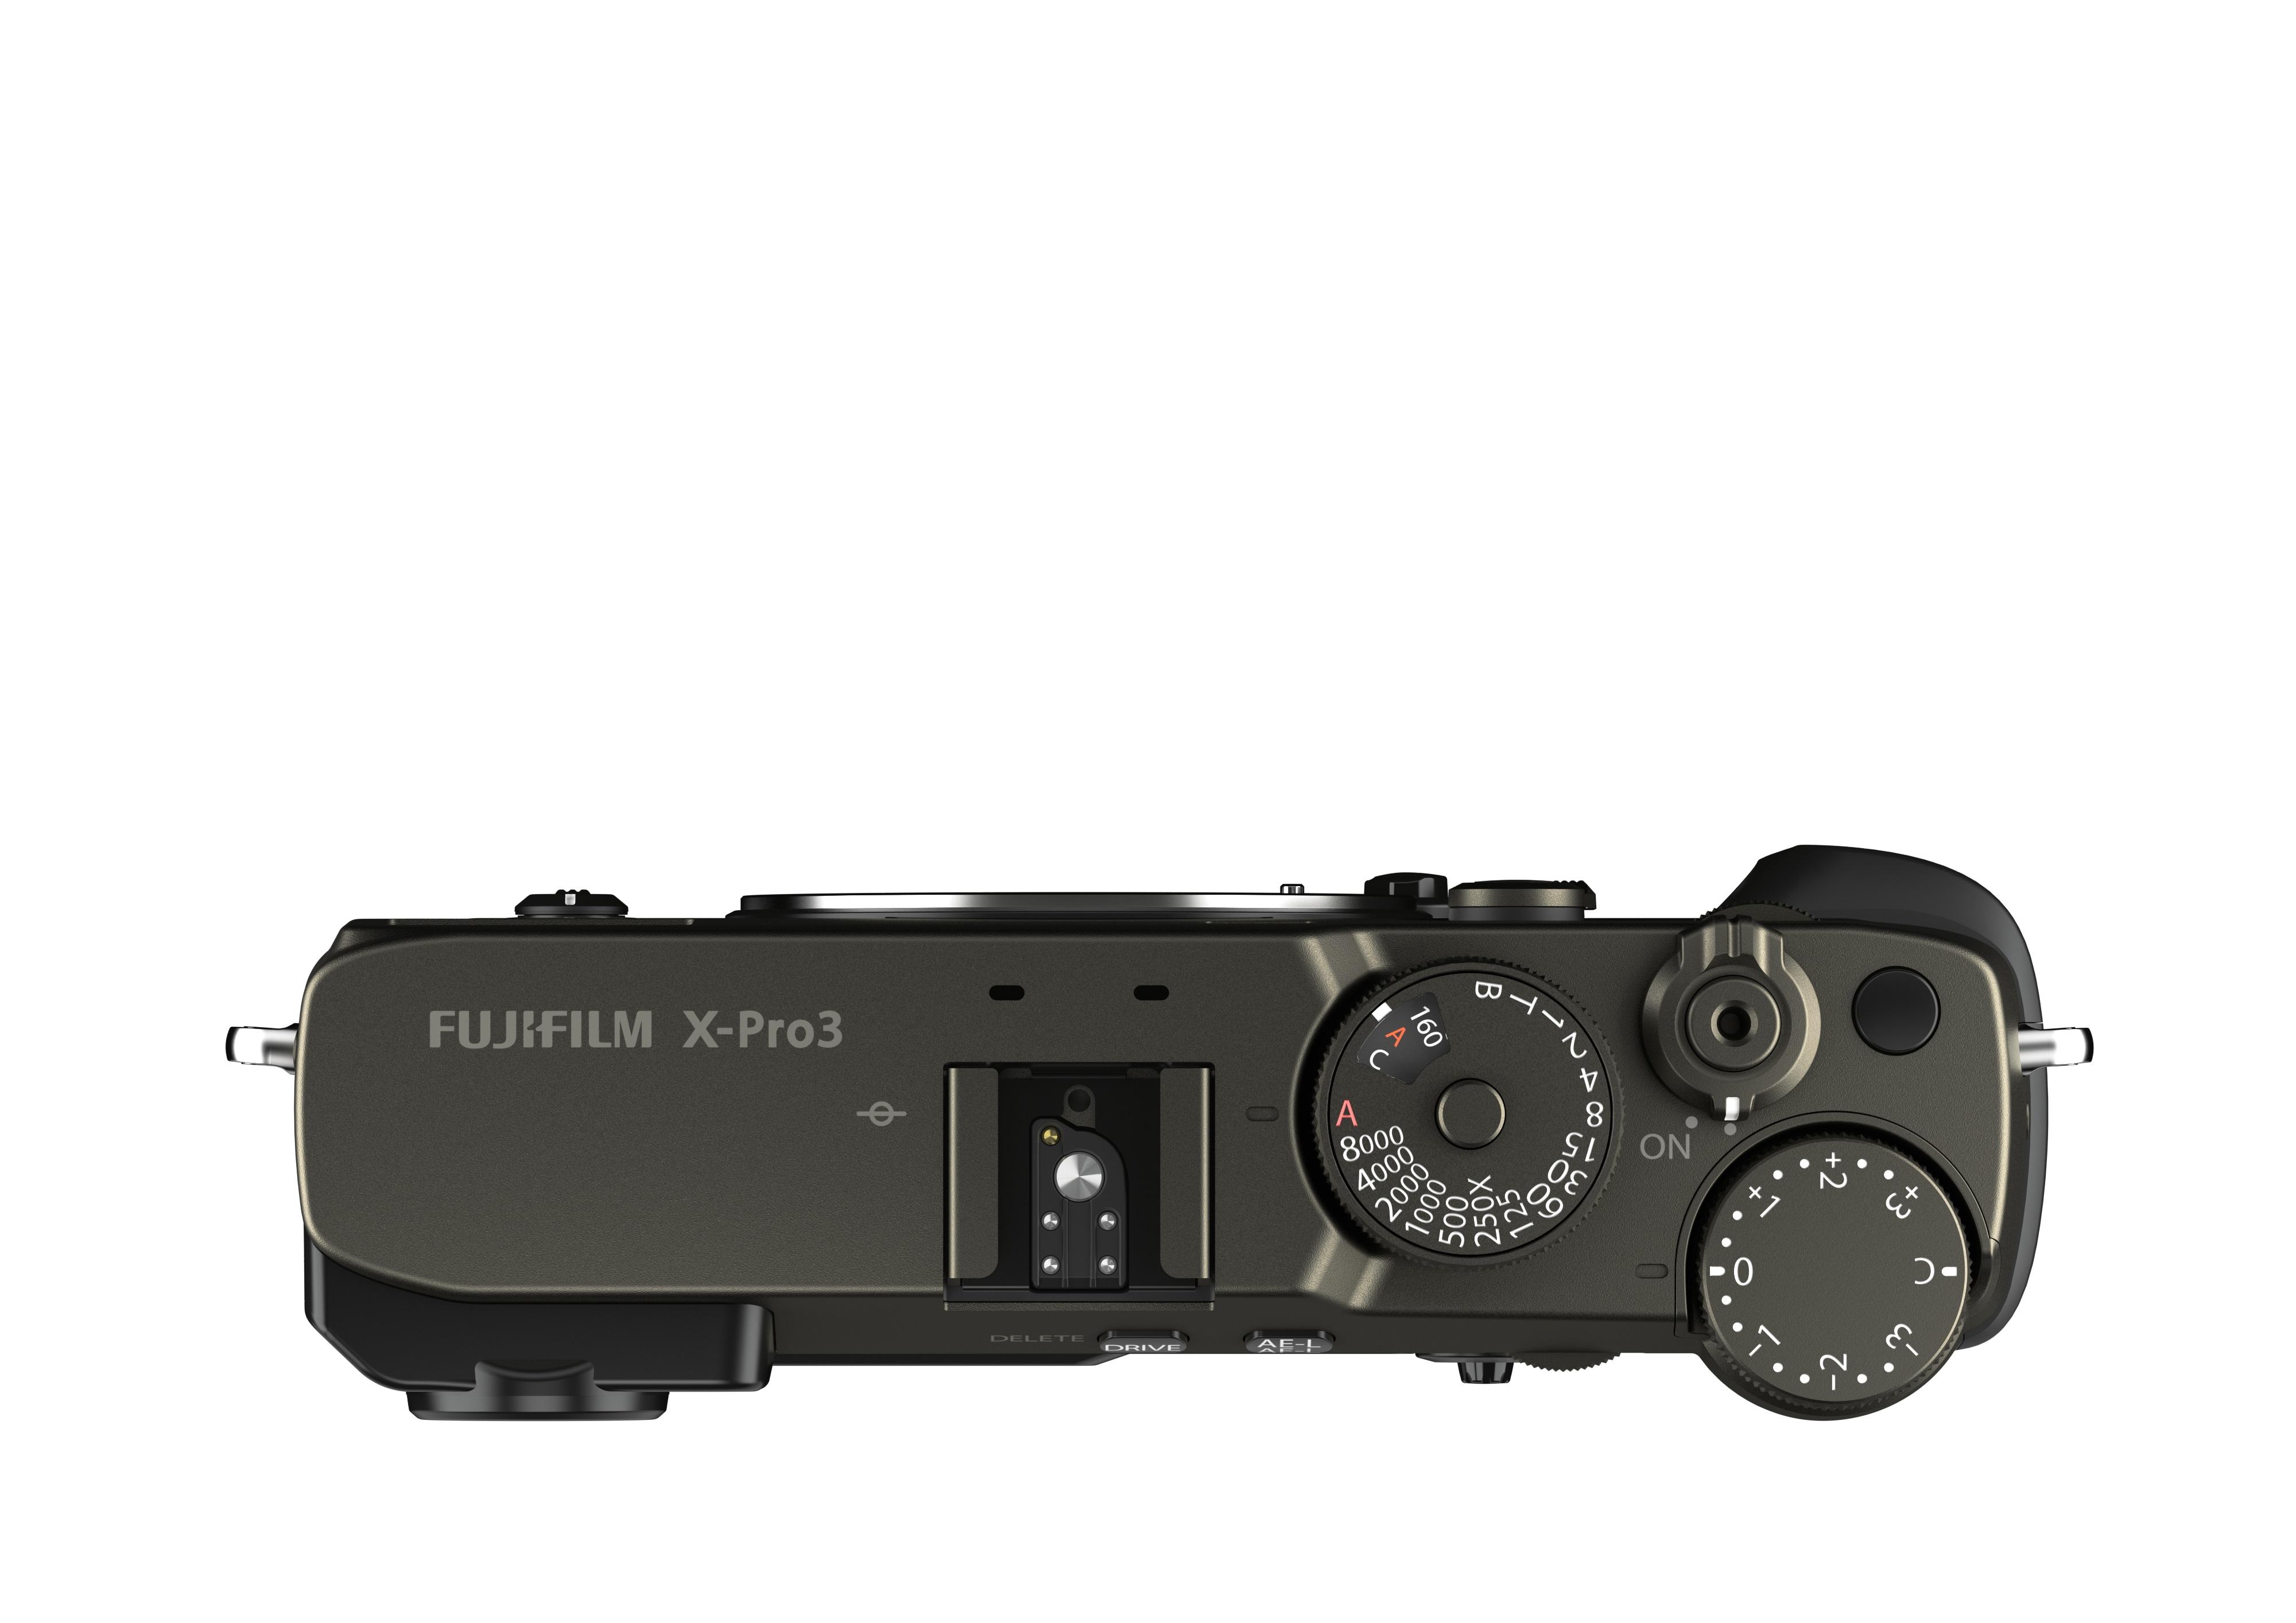 Fujifilm X-Pro3 kamerhus Dura svart